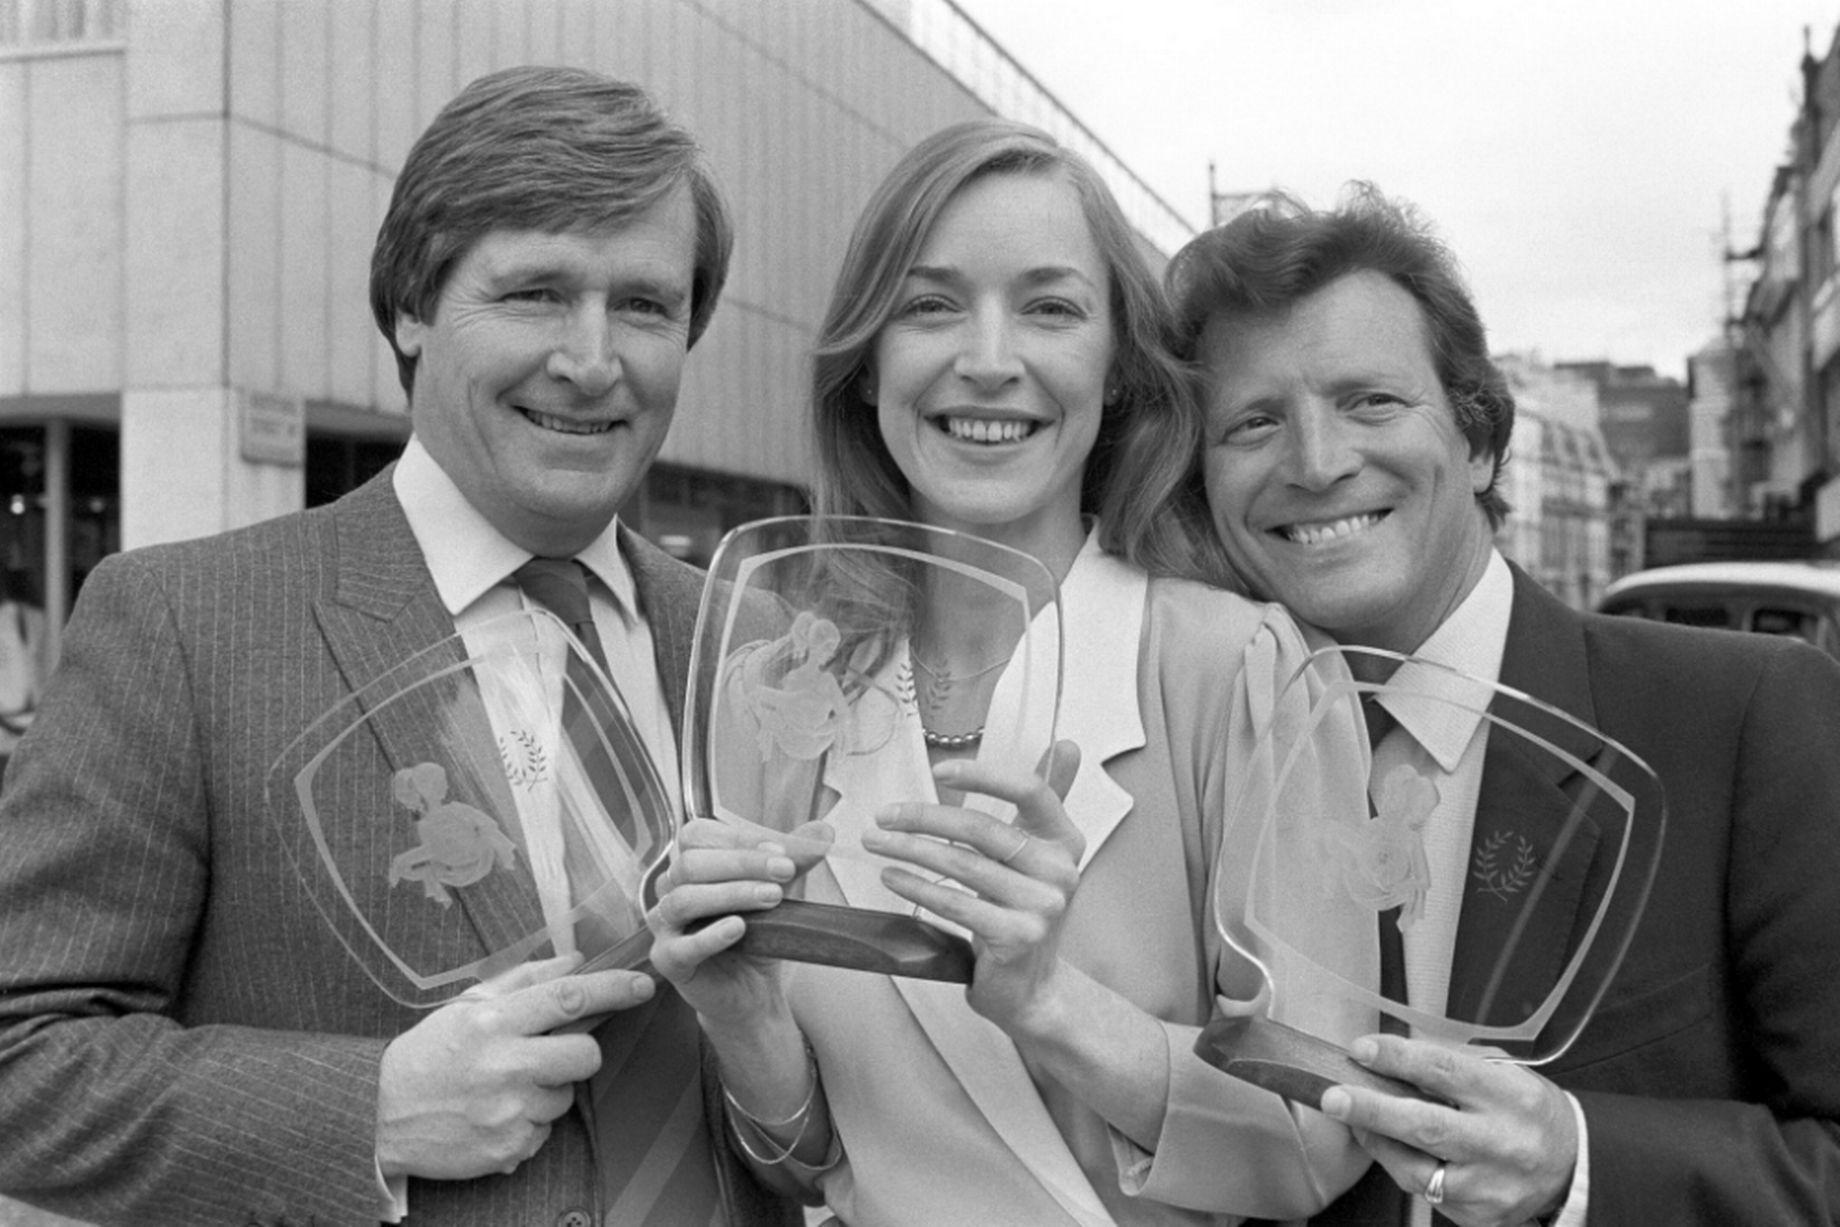 Ken Dedrie & Ken with their awards